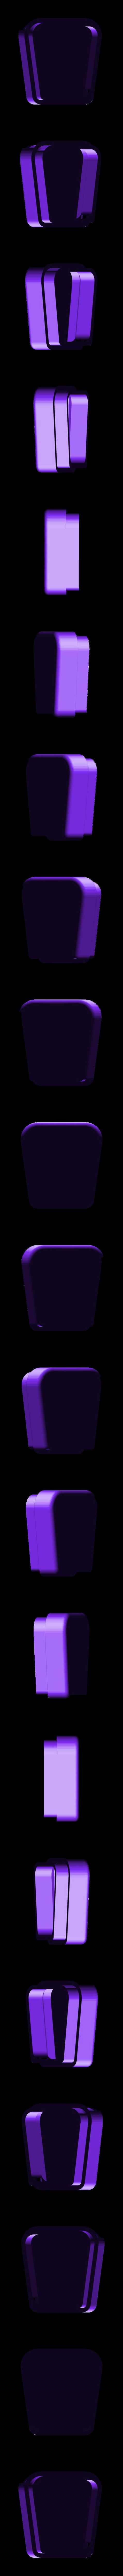 hammer-cap.stl Download free STL file Fix It Felix Hammer • 3D printer design, Adafruit